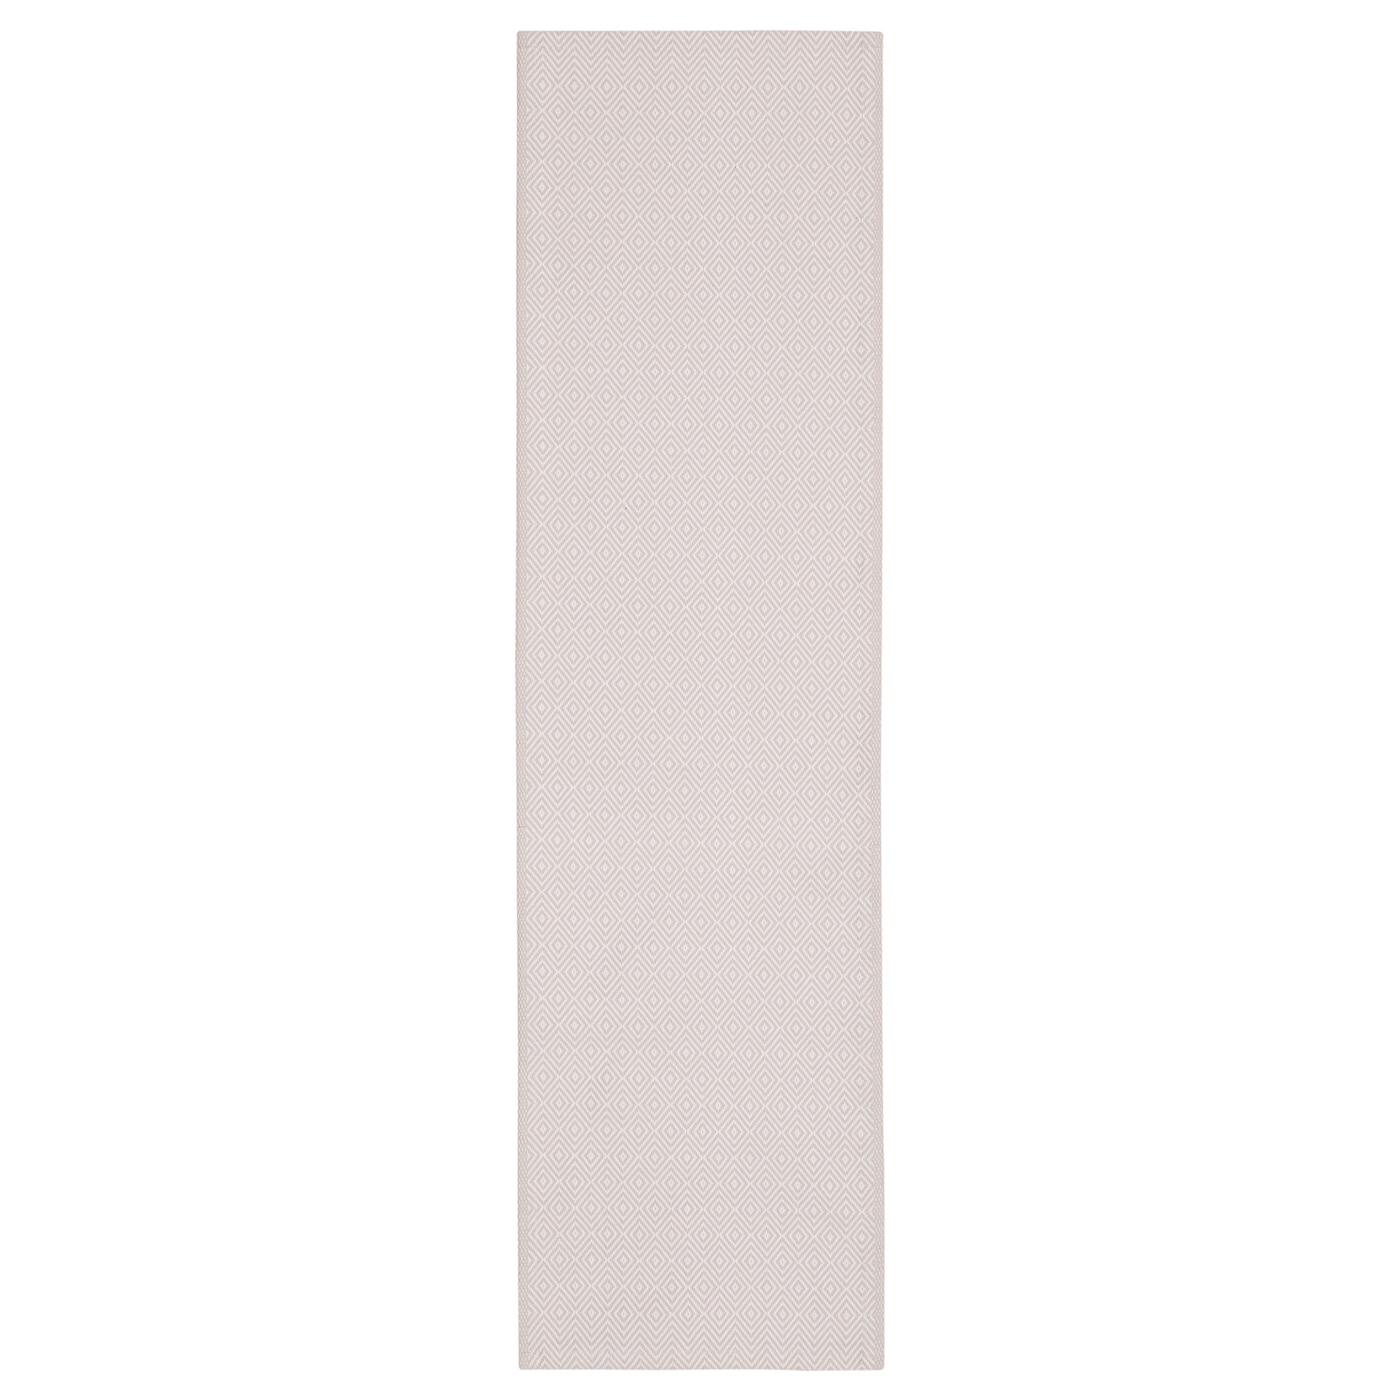 goddag chemin de table beige blanc 35x130 cm ikea. Black Bedroom Furniture Sets. Home Design Ideas